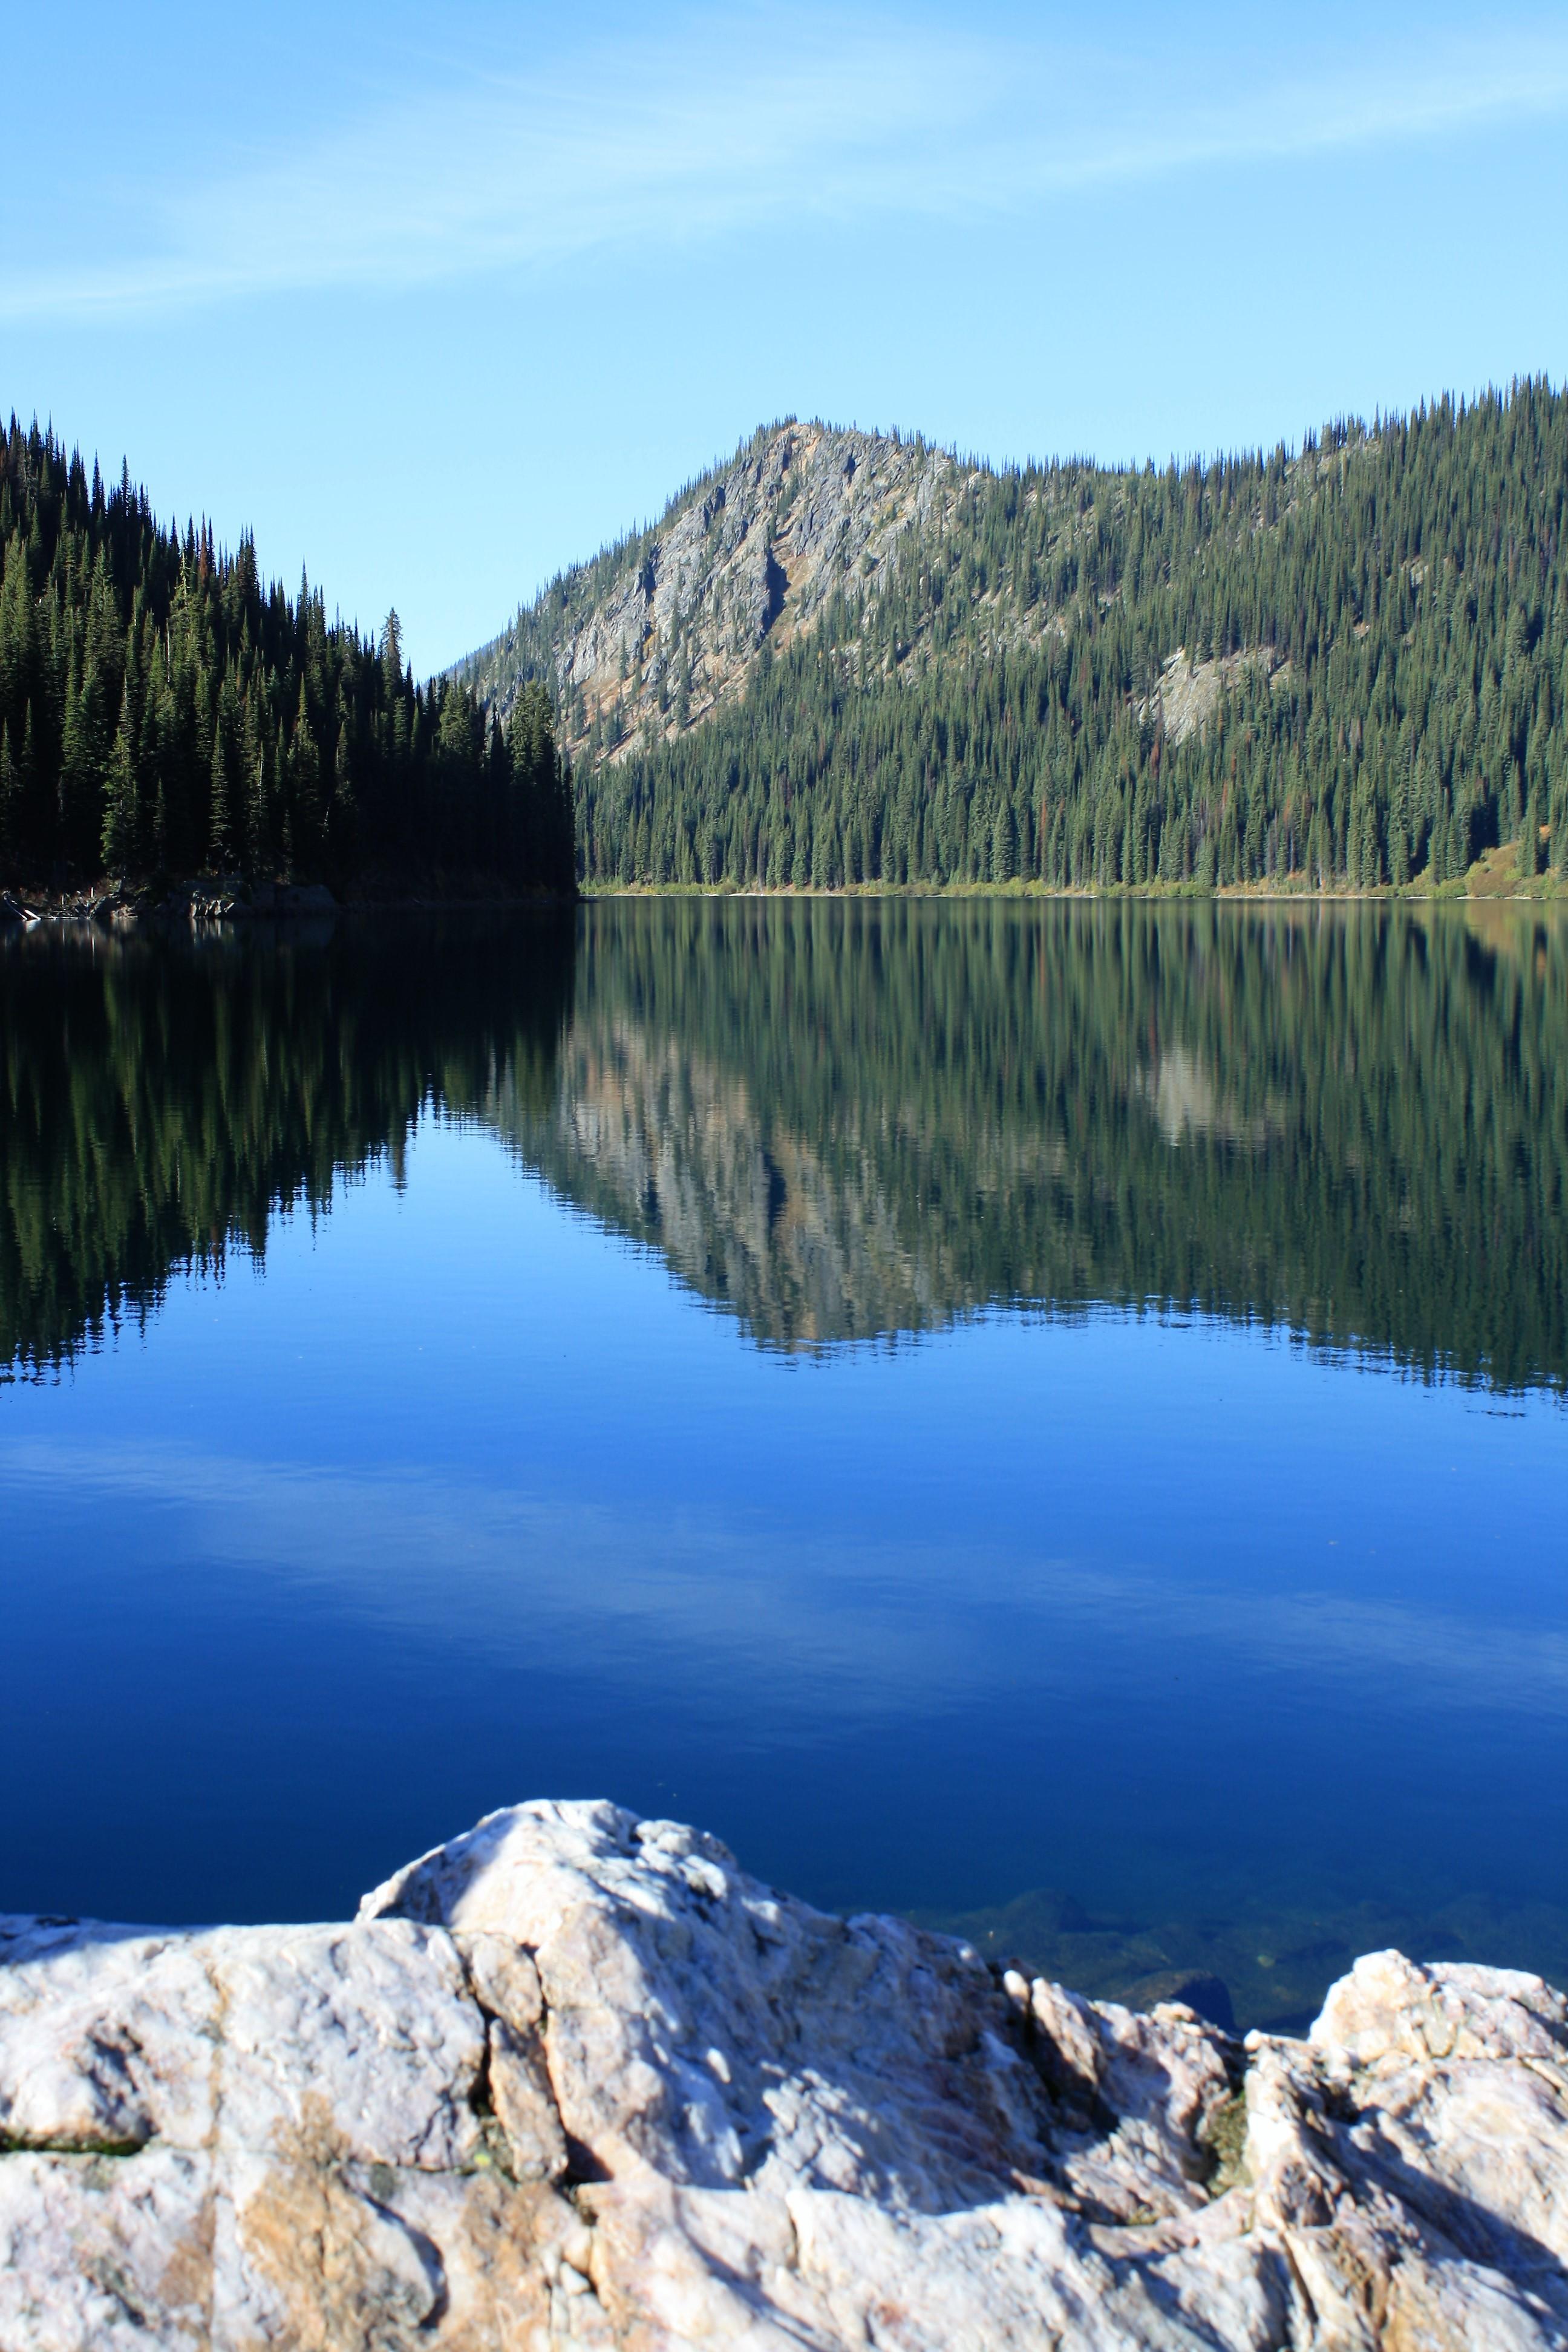 DM_nature_landscape_plaidlake_0503